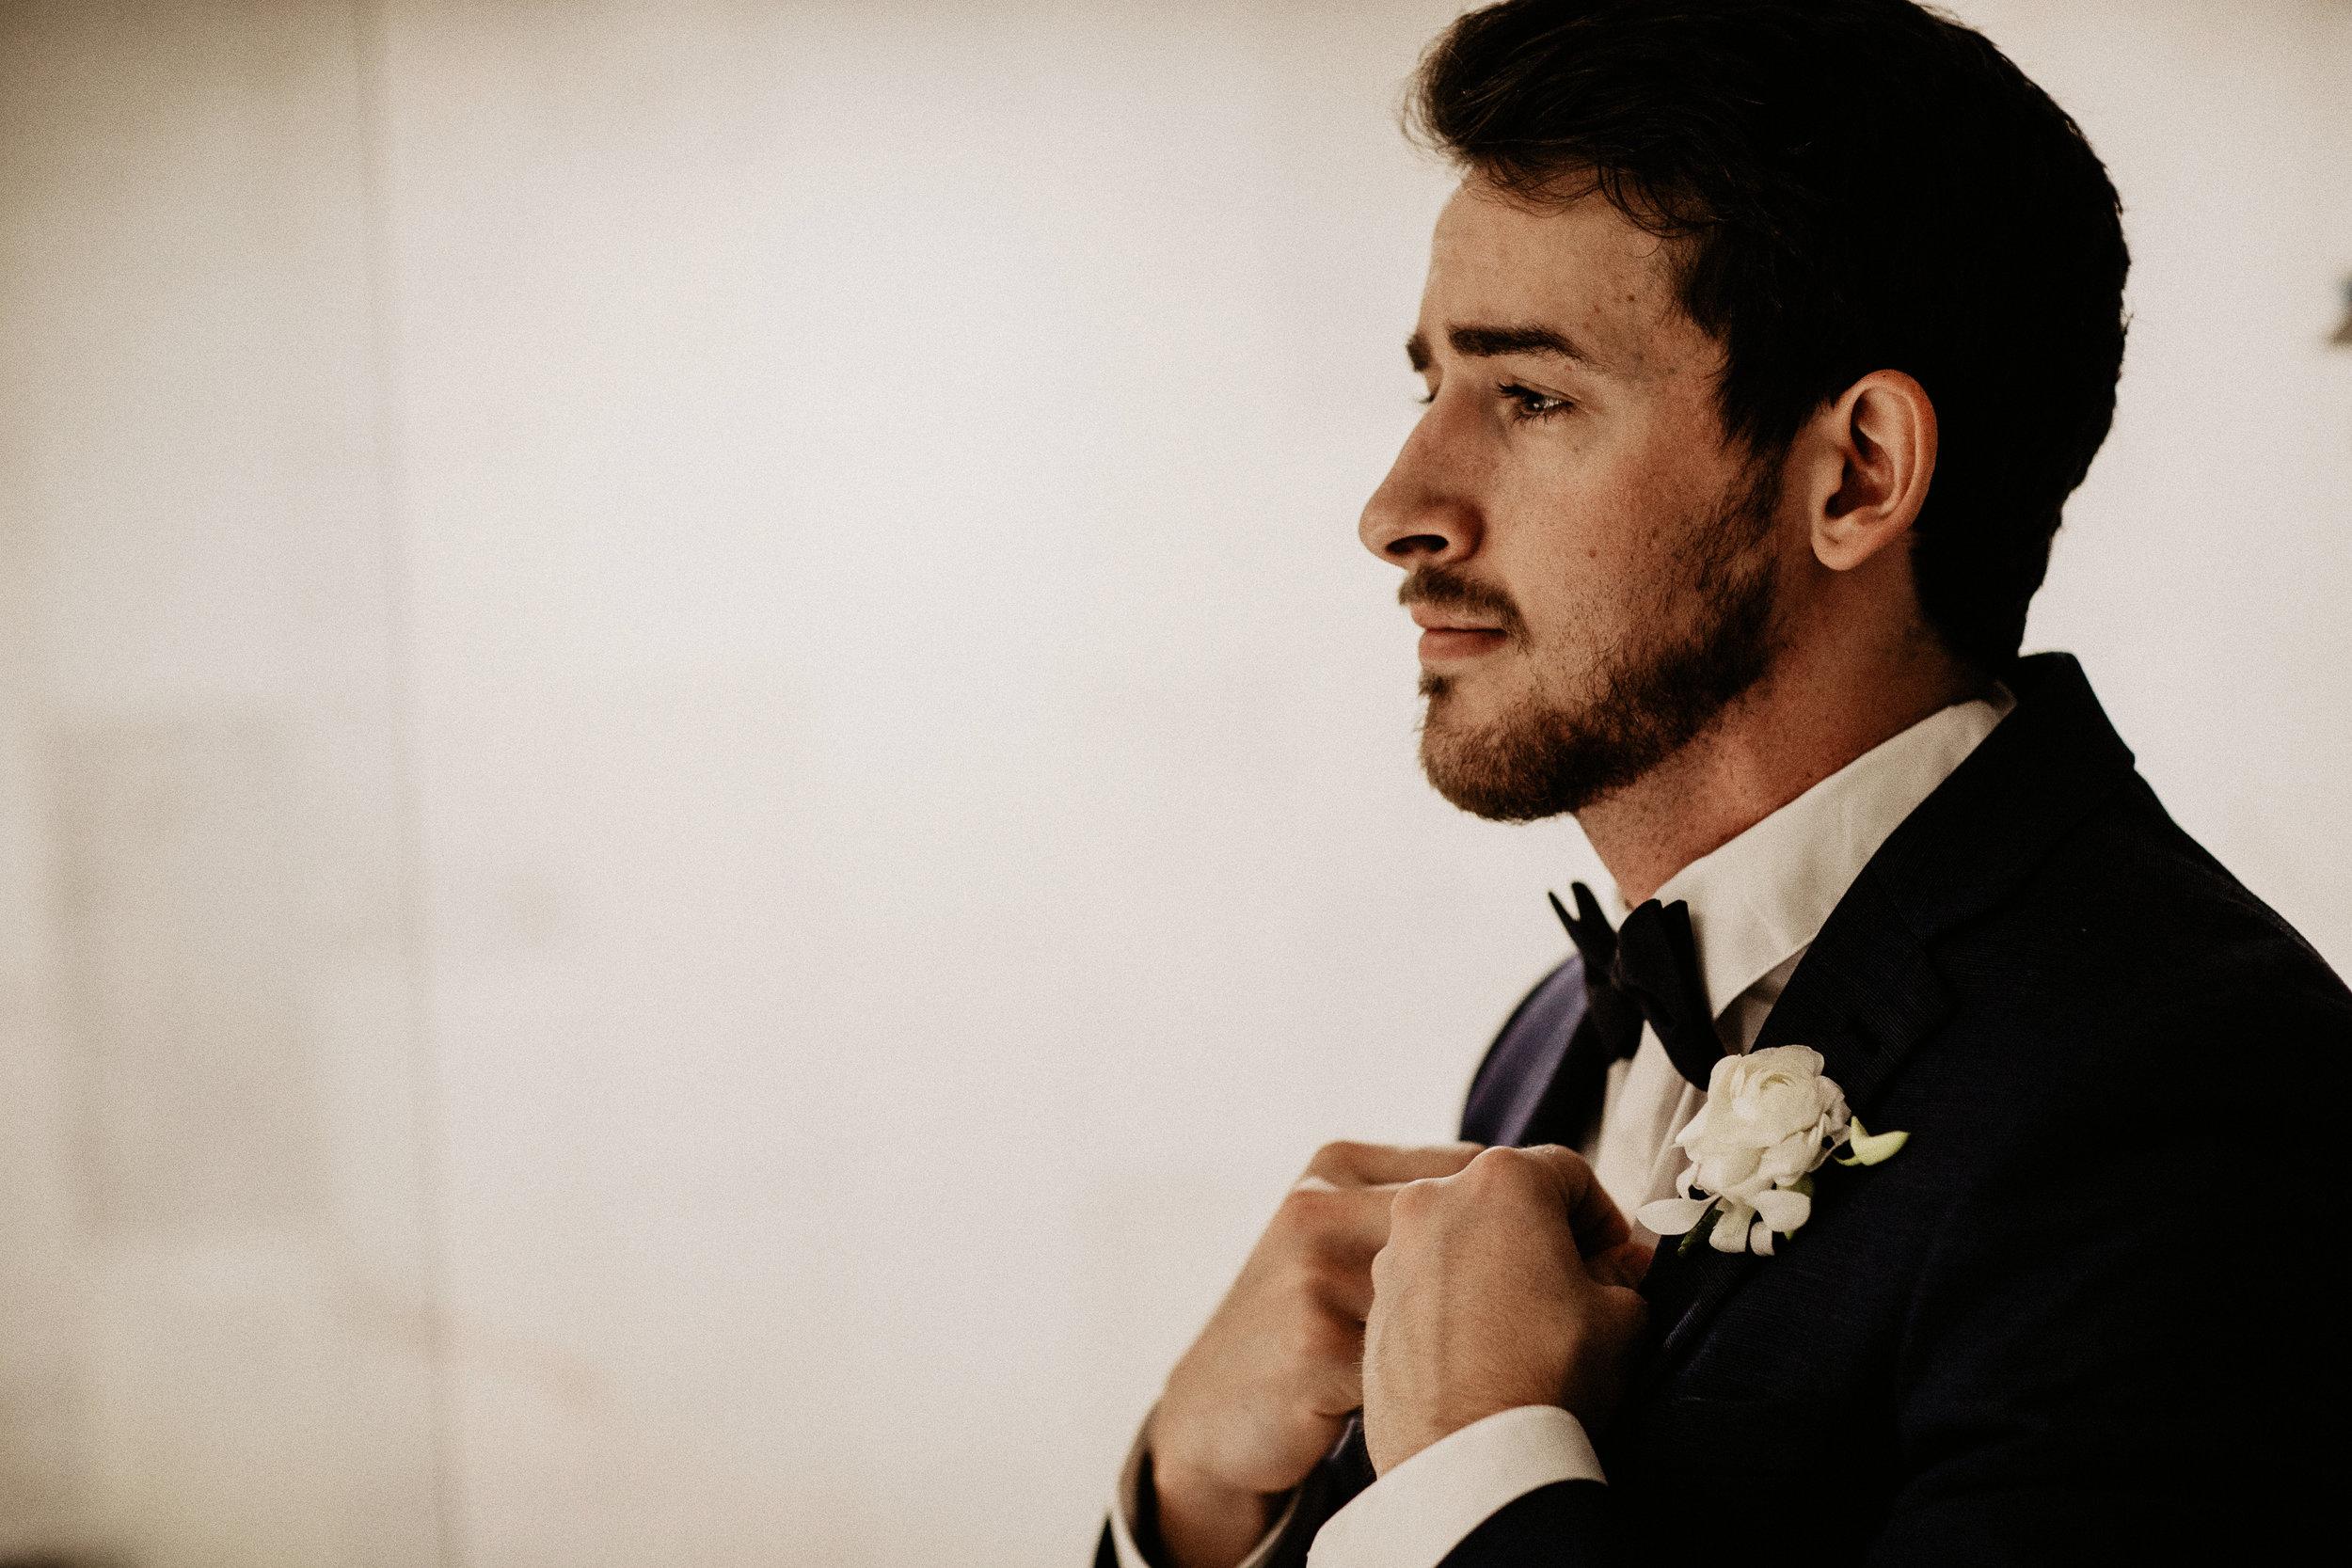 alfonso_flores_destination_wedding_photography_puerto_vallarta_hotel_barcelo_vallarta_cuttler_amela-107.JPG